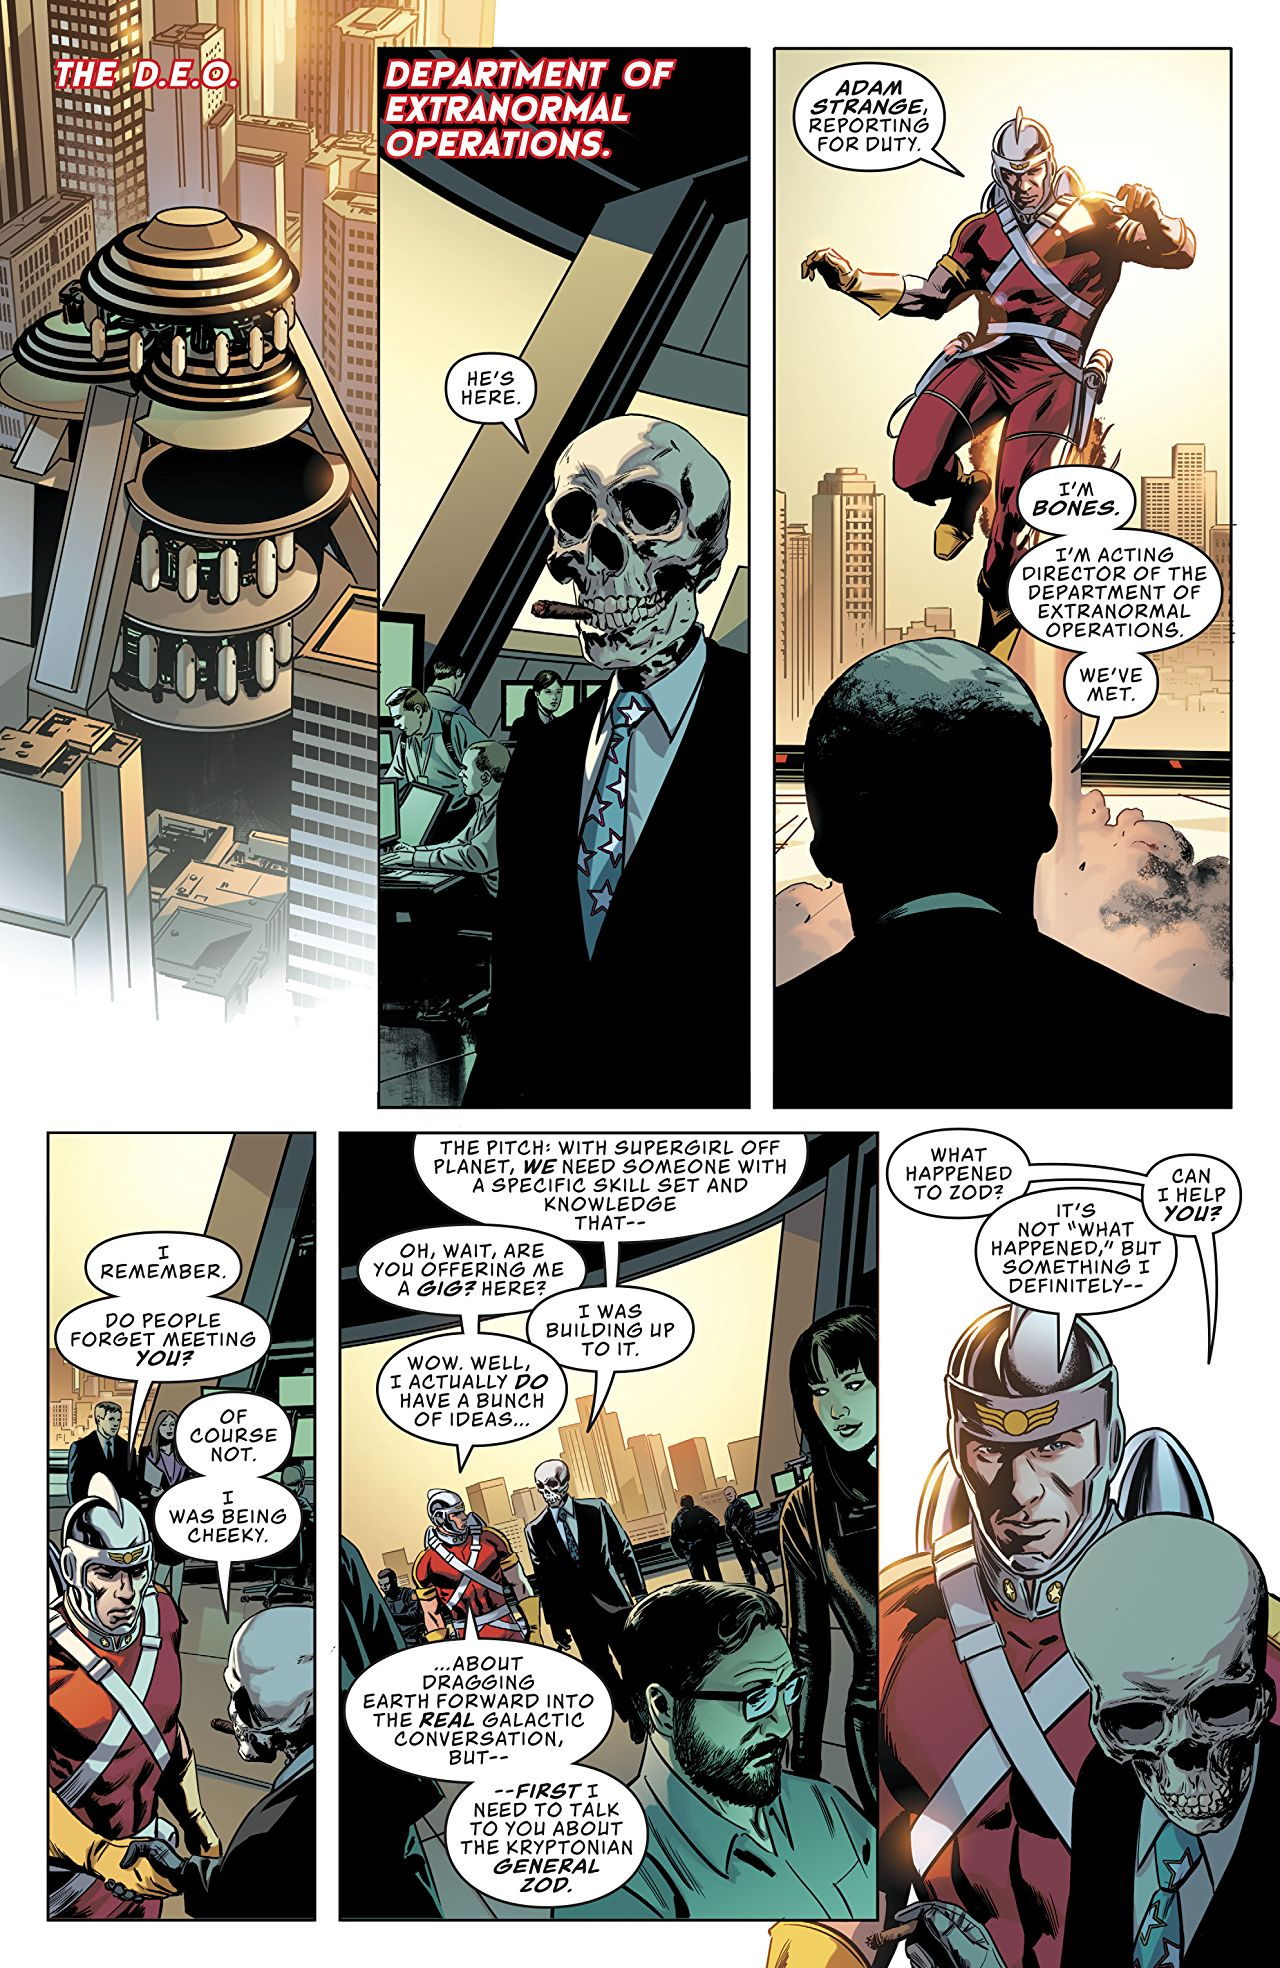 Action Comics 1008 2.jpg